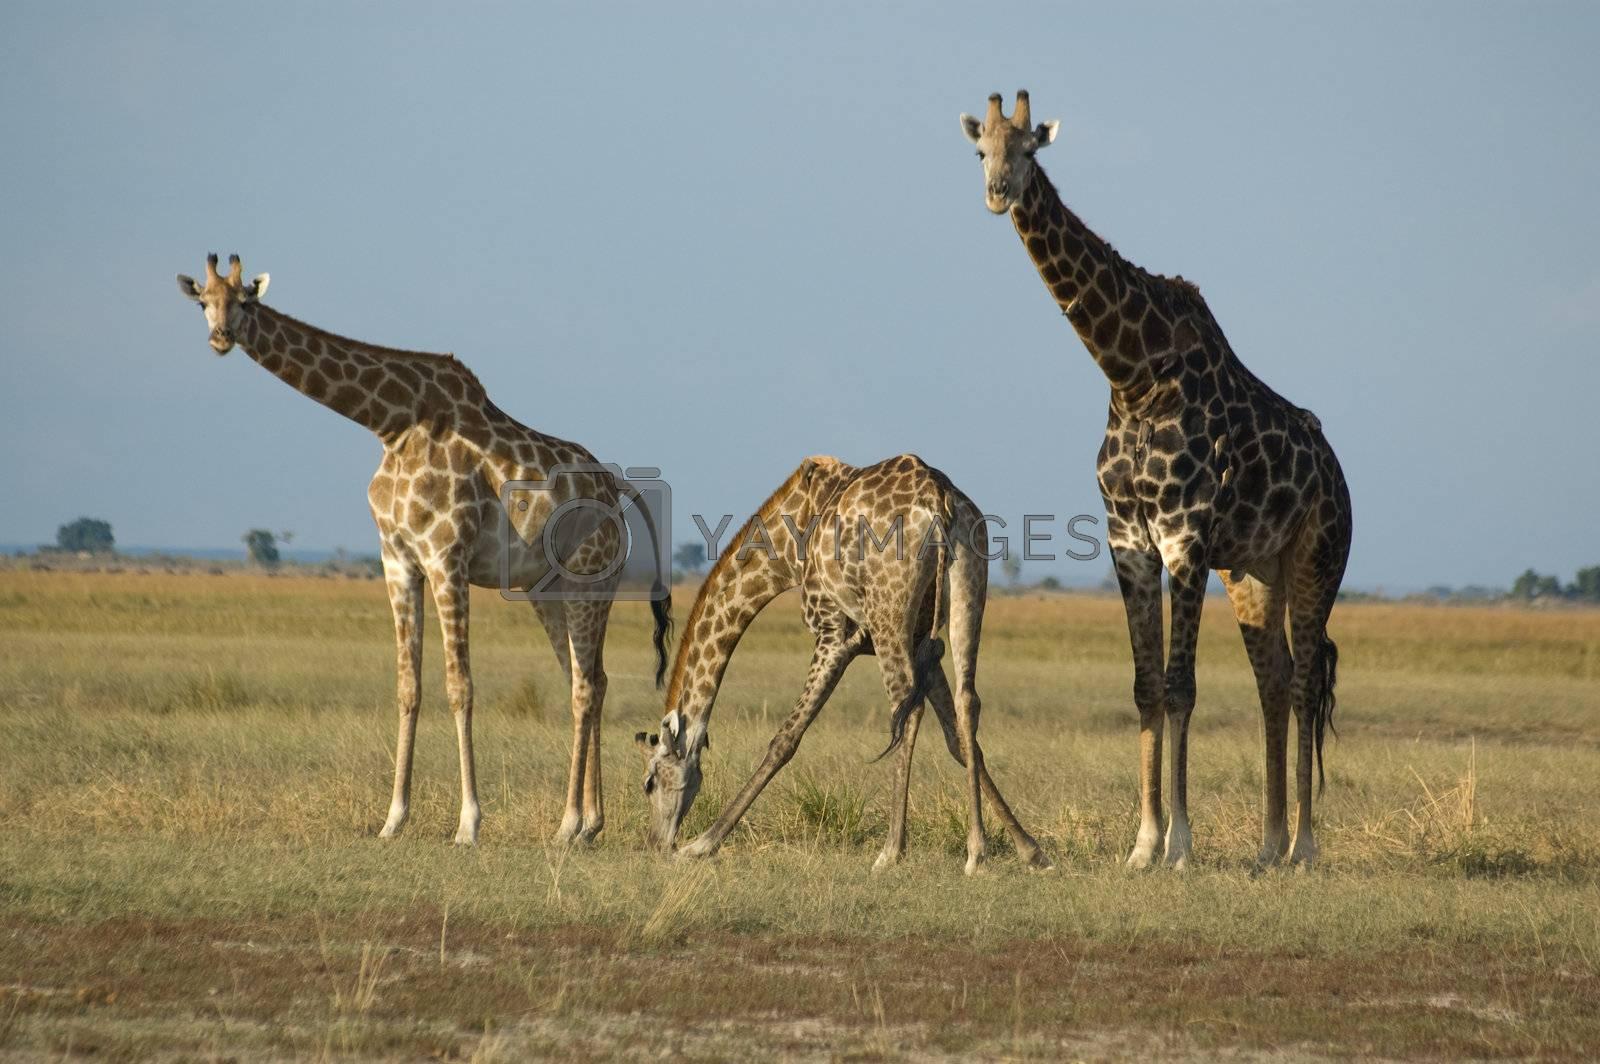 Drinking giraffes by jivz